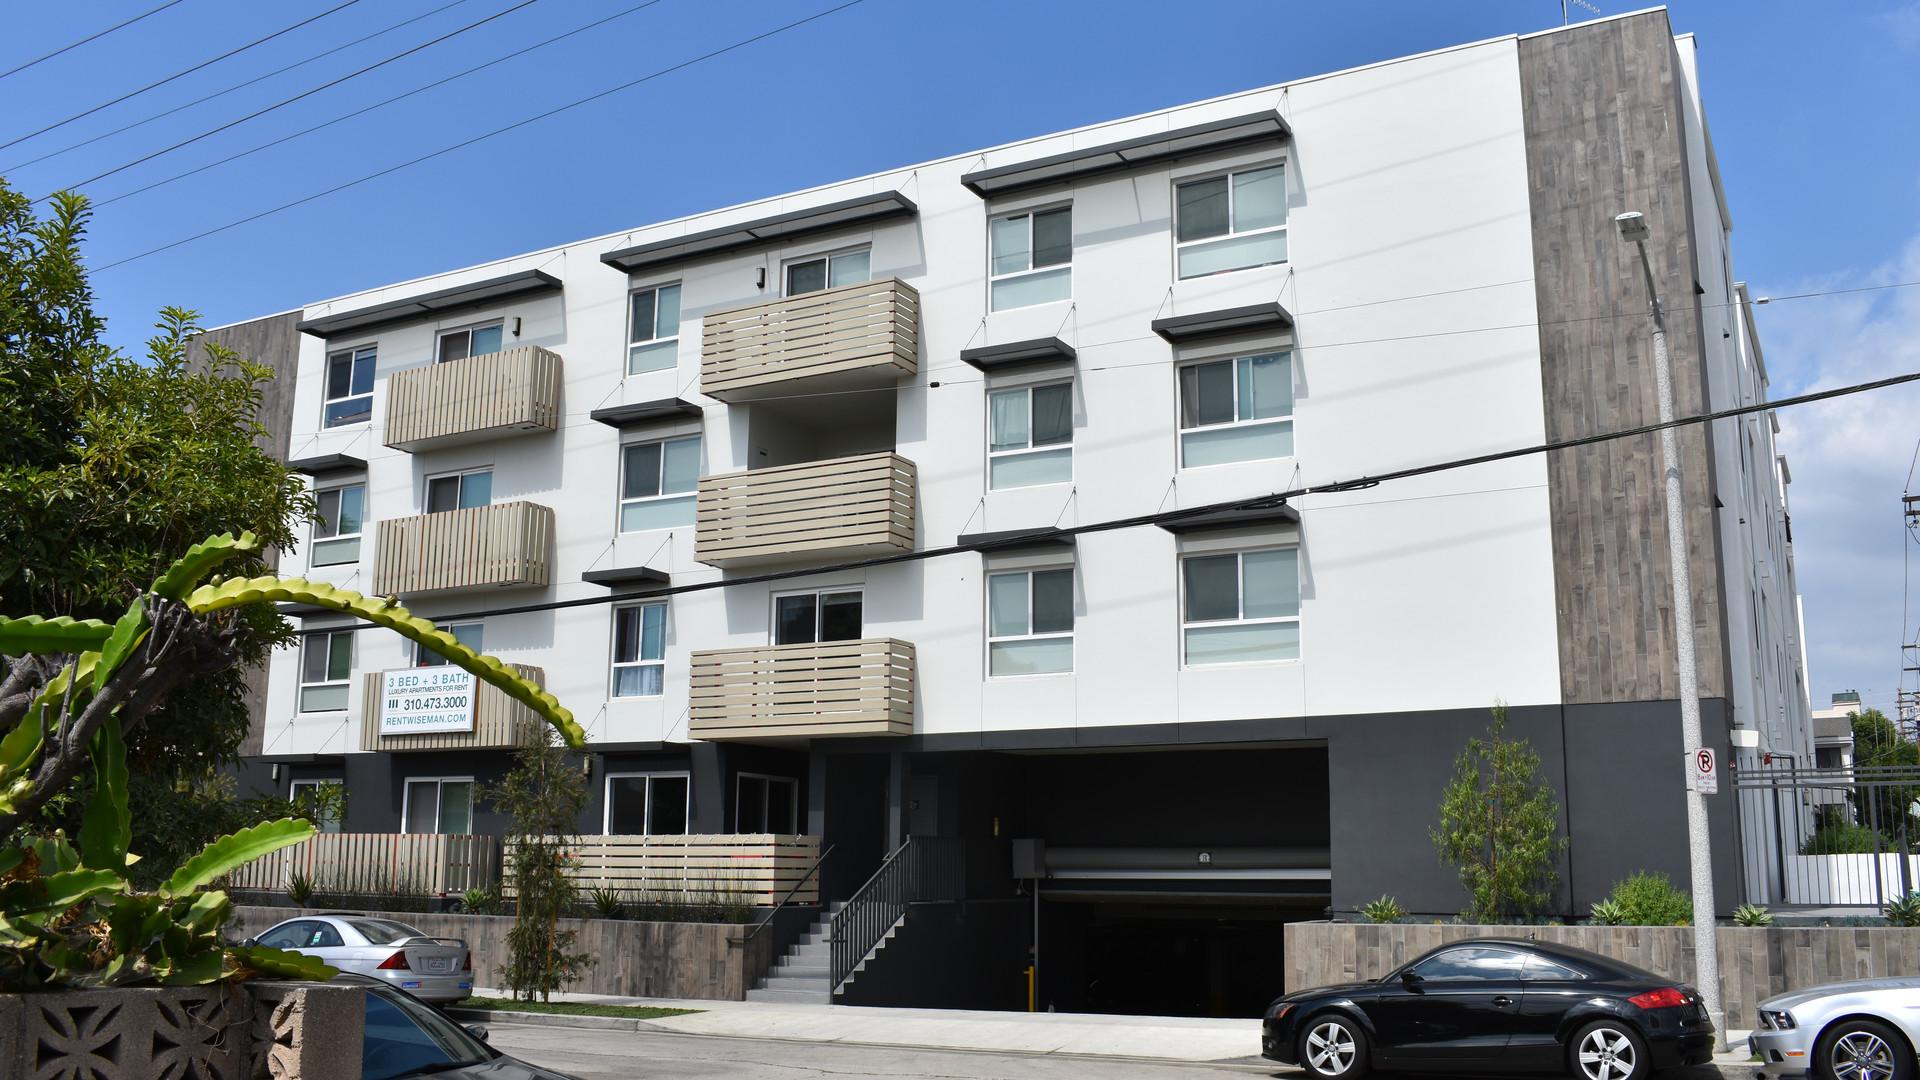 West Los Angeles Multi-Family Refinance - 49 Units